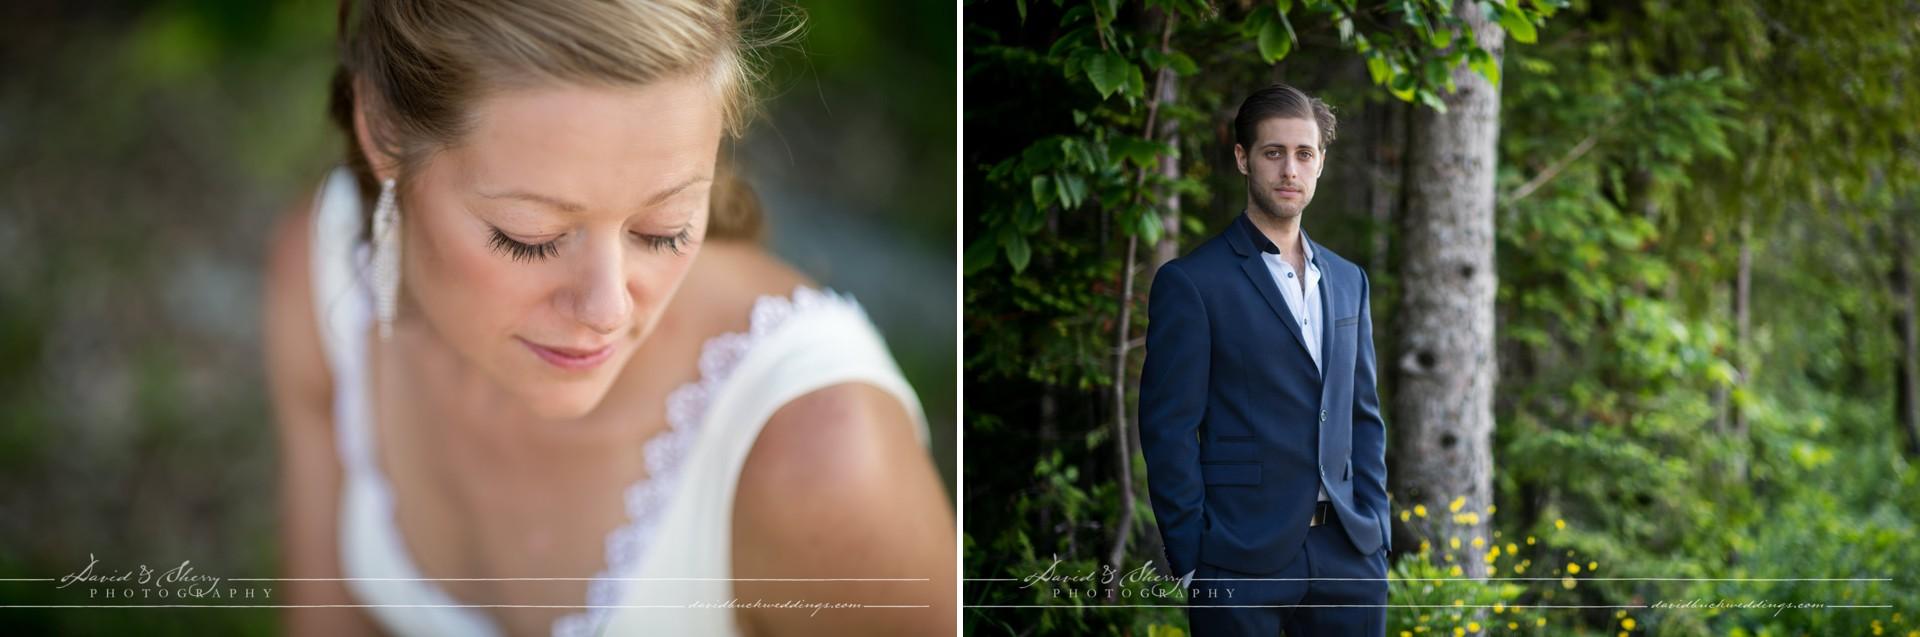 Wiarton_Wedding_Photography_25